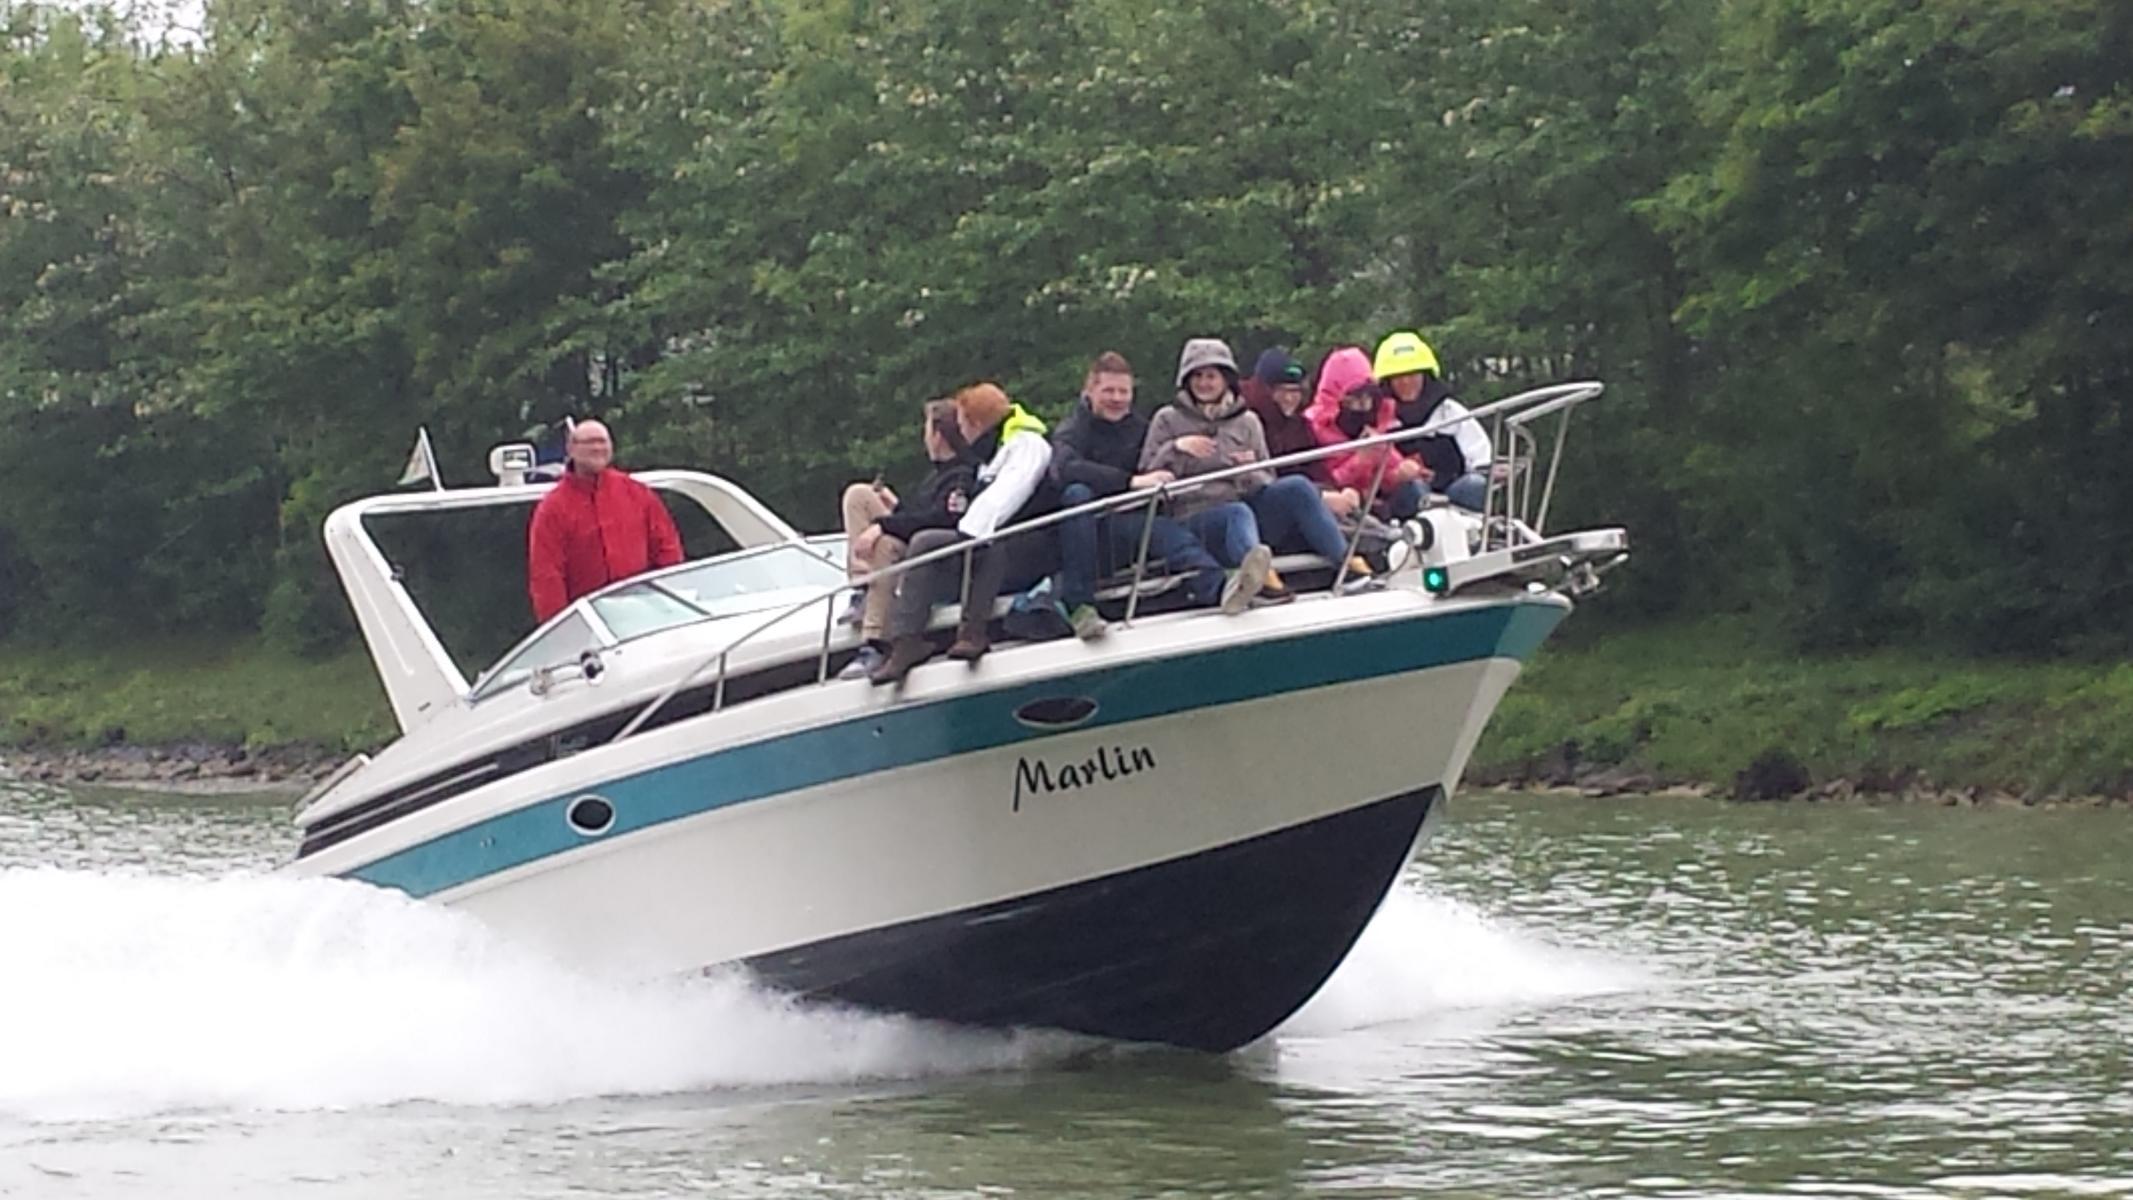 Ausflug mit Kids - Monasteria Yachtclub Münster